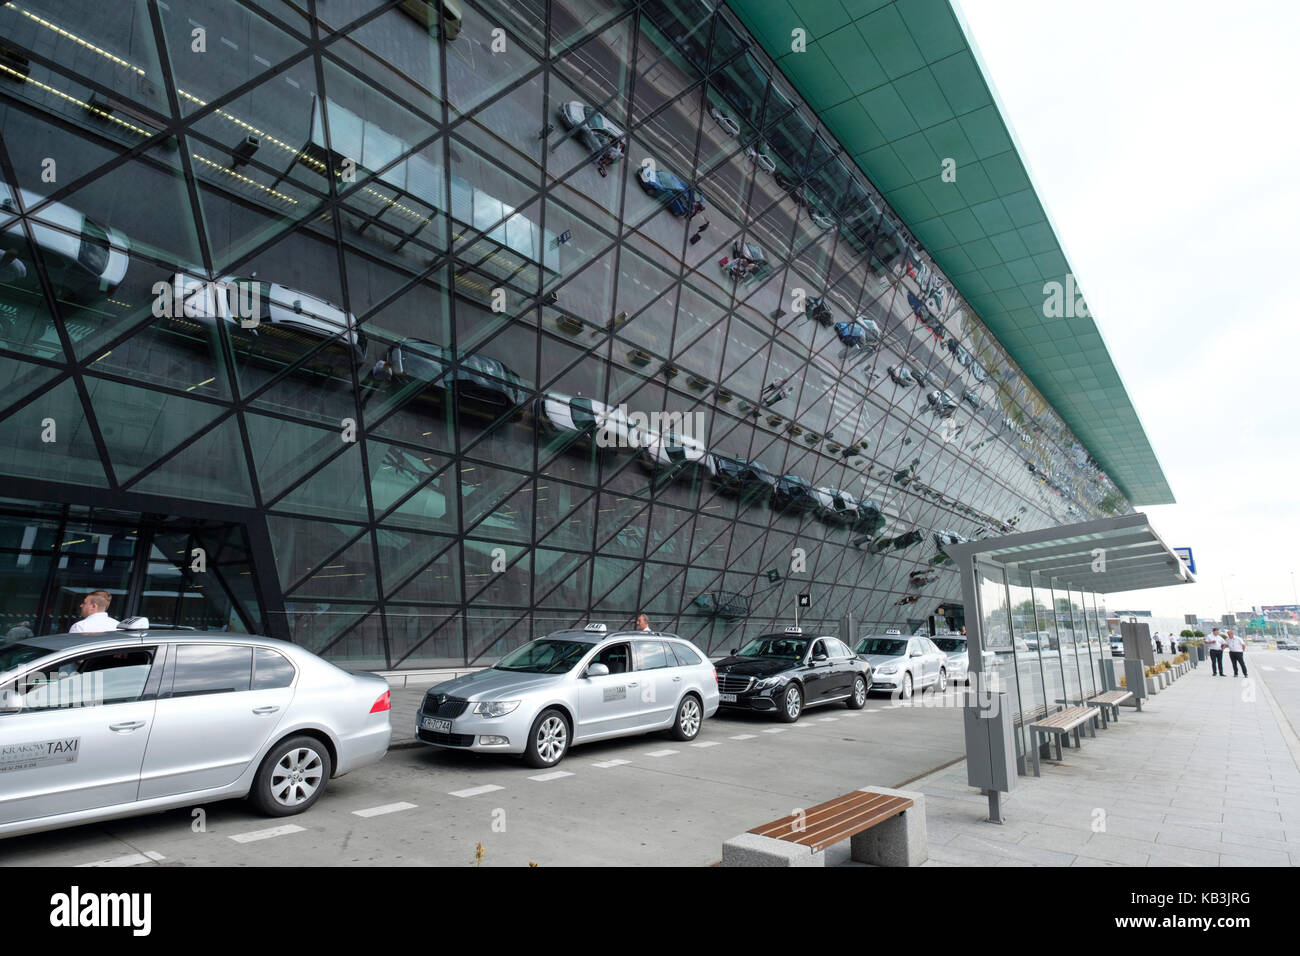 John Paul II International Airport Kraków–Balice, Krakow, Poland, Europe - Stock Image